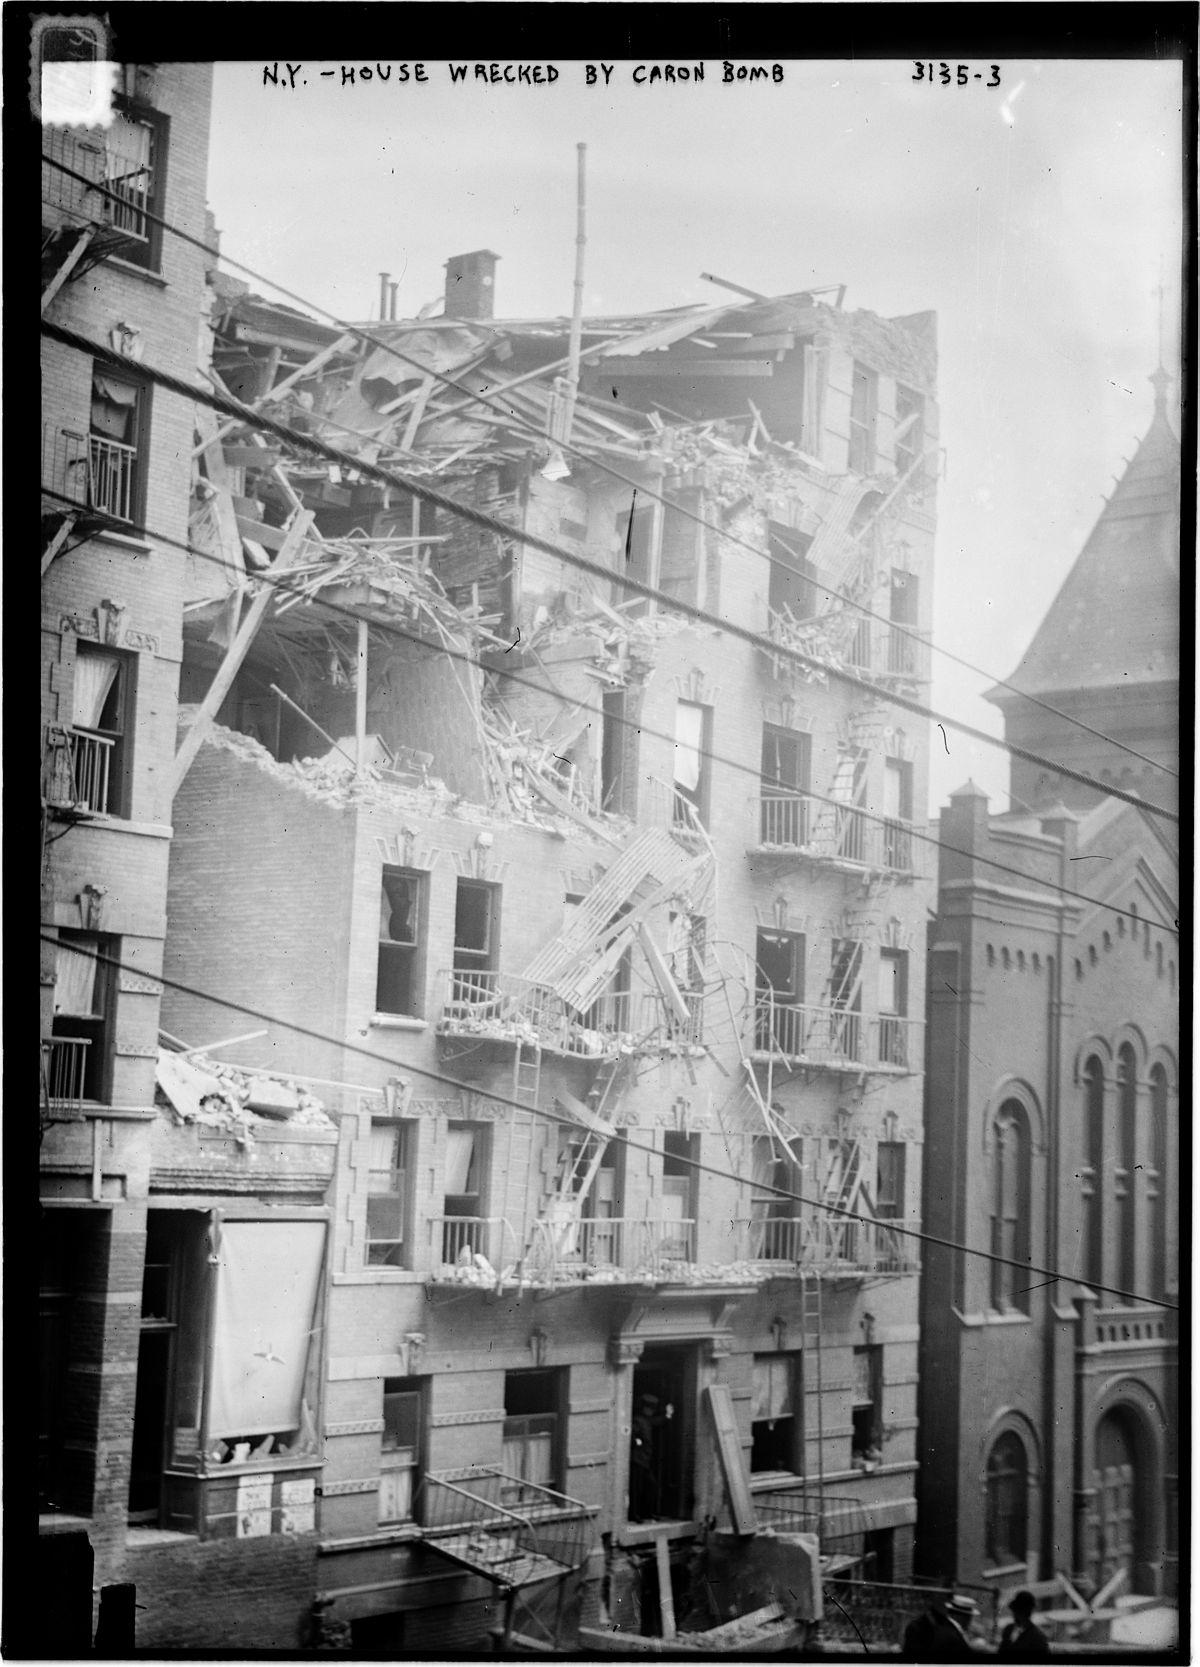 Lexington Avenue explosion - Wikipedia